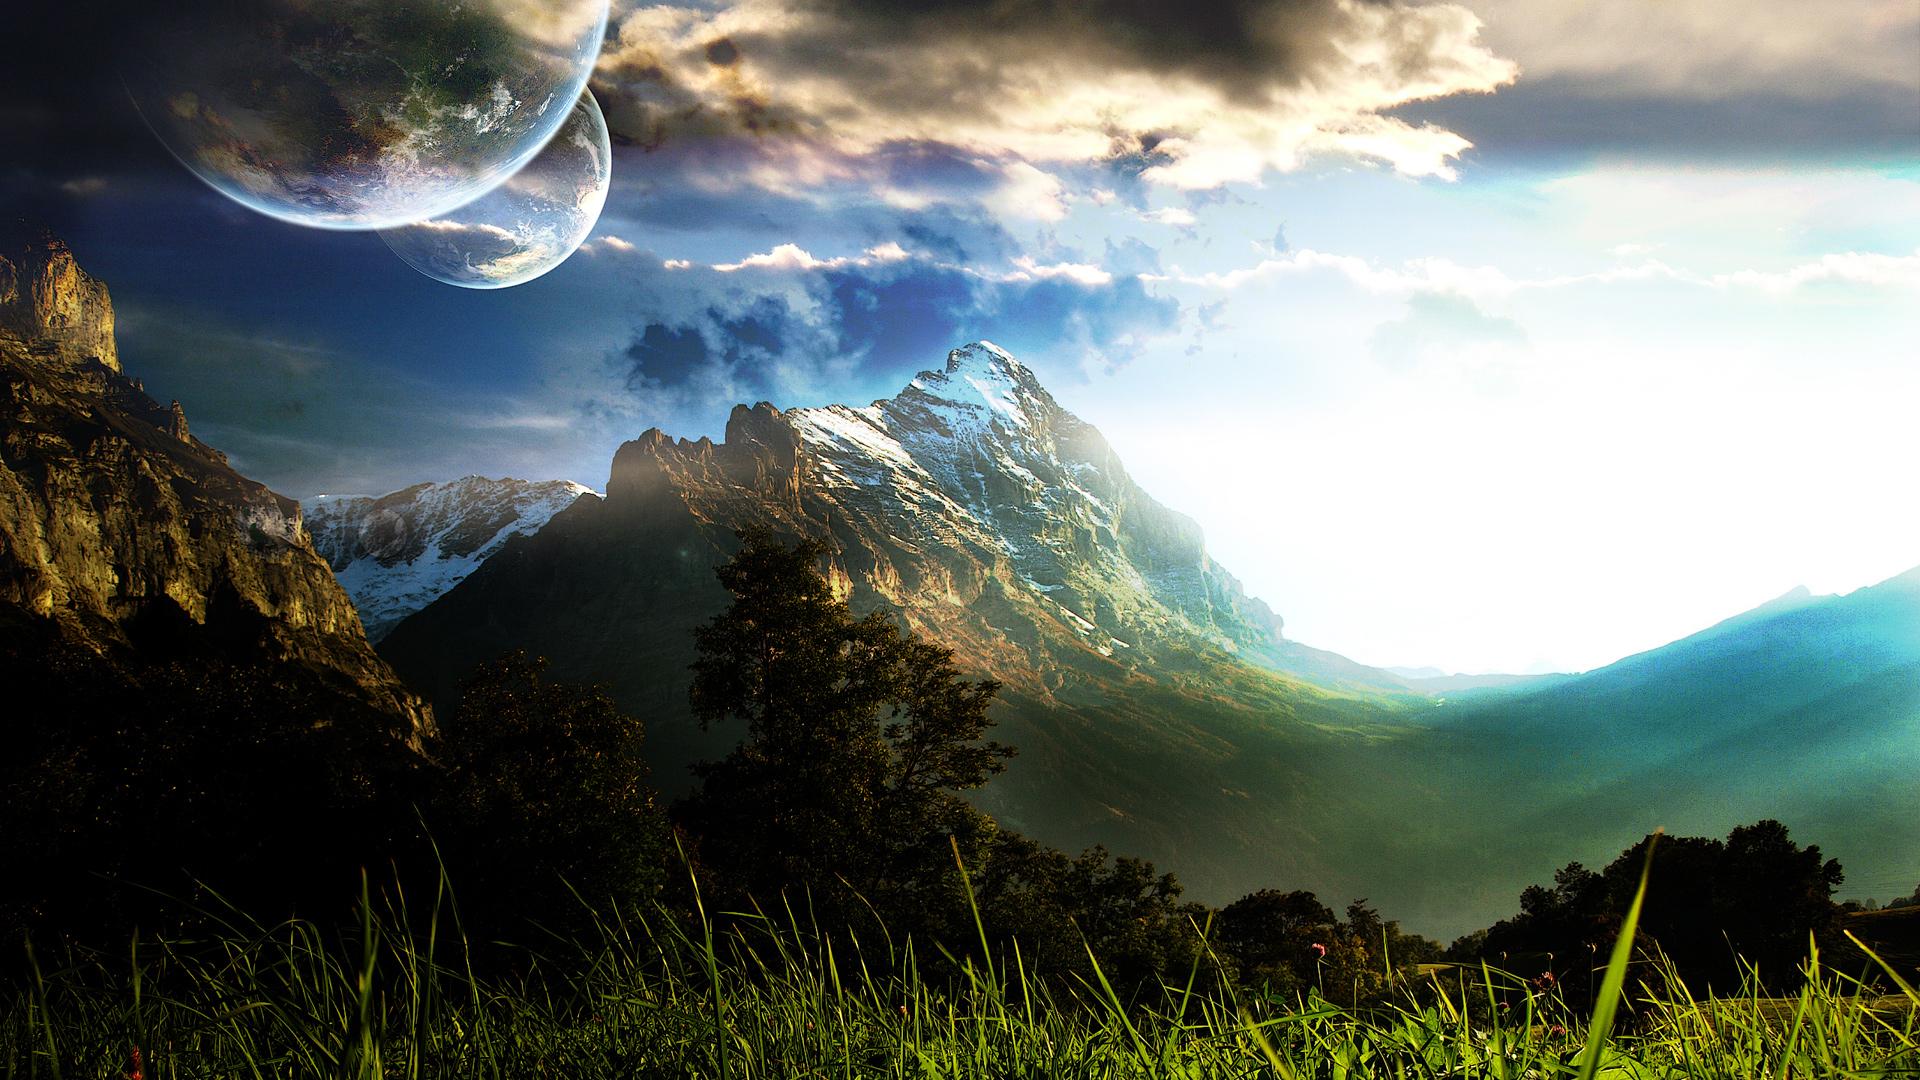 landscape nature new images fullscreen desktop landscape hd wallpapers free download